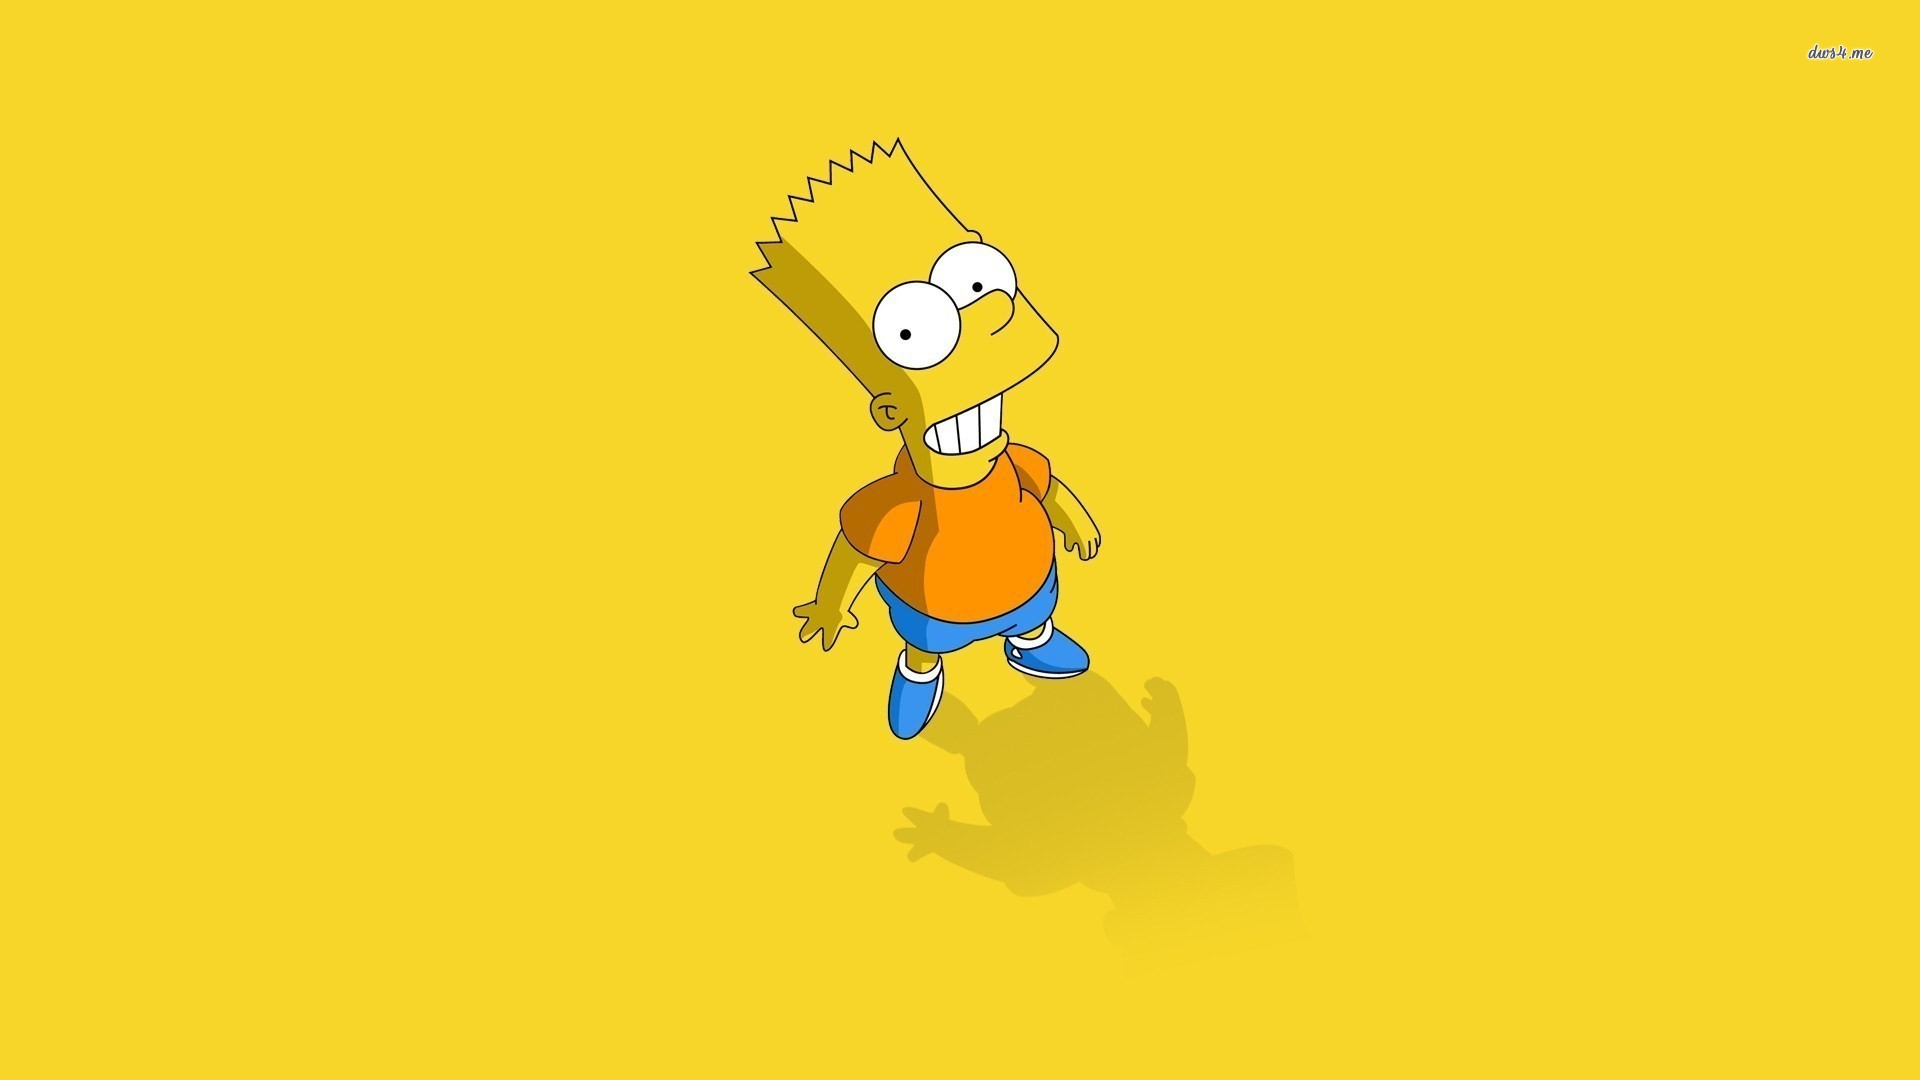 Bart Simpson wallpaper 1280x800 Bart Simpson wallpaper 1366x768 Bart 1920x1080